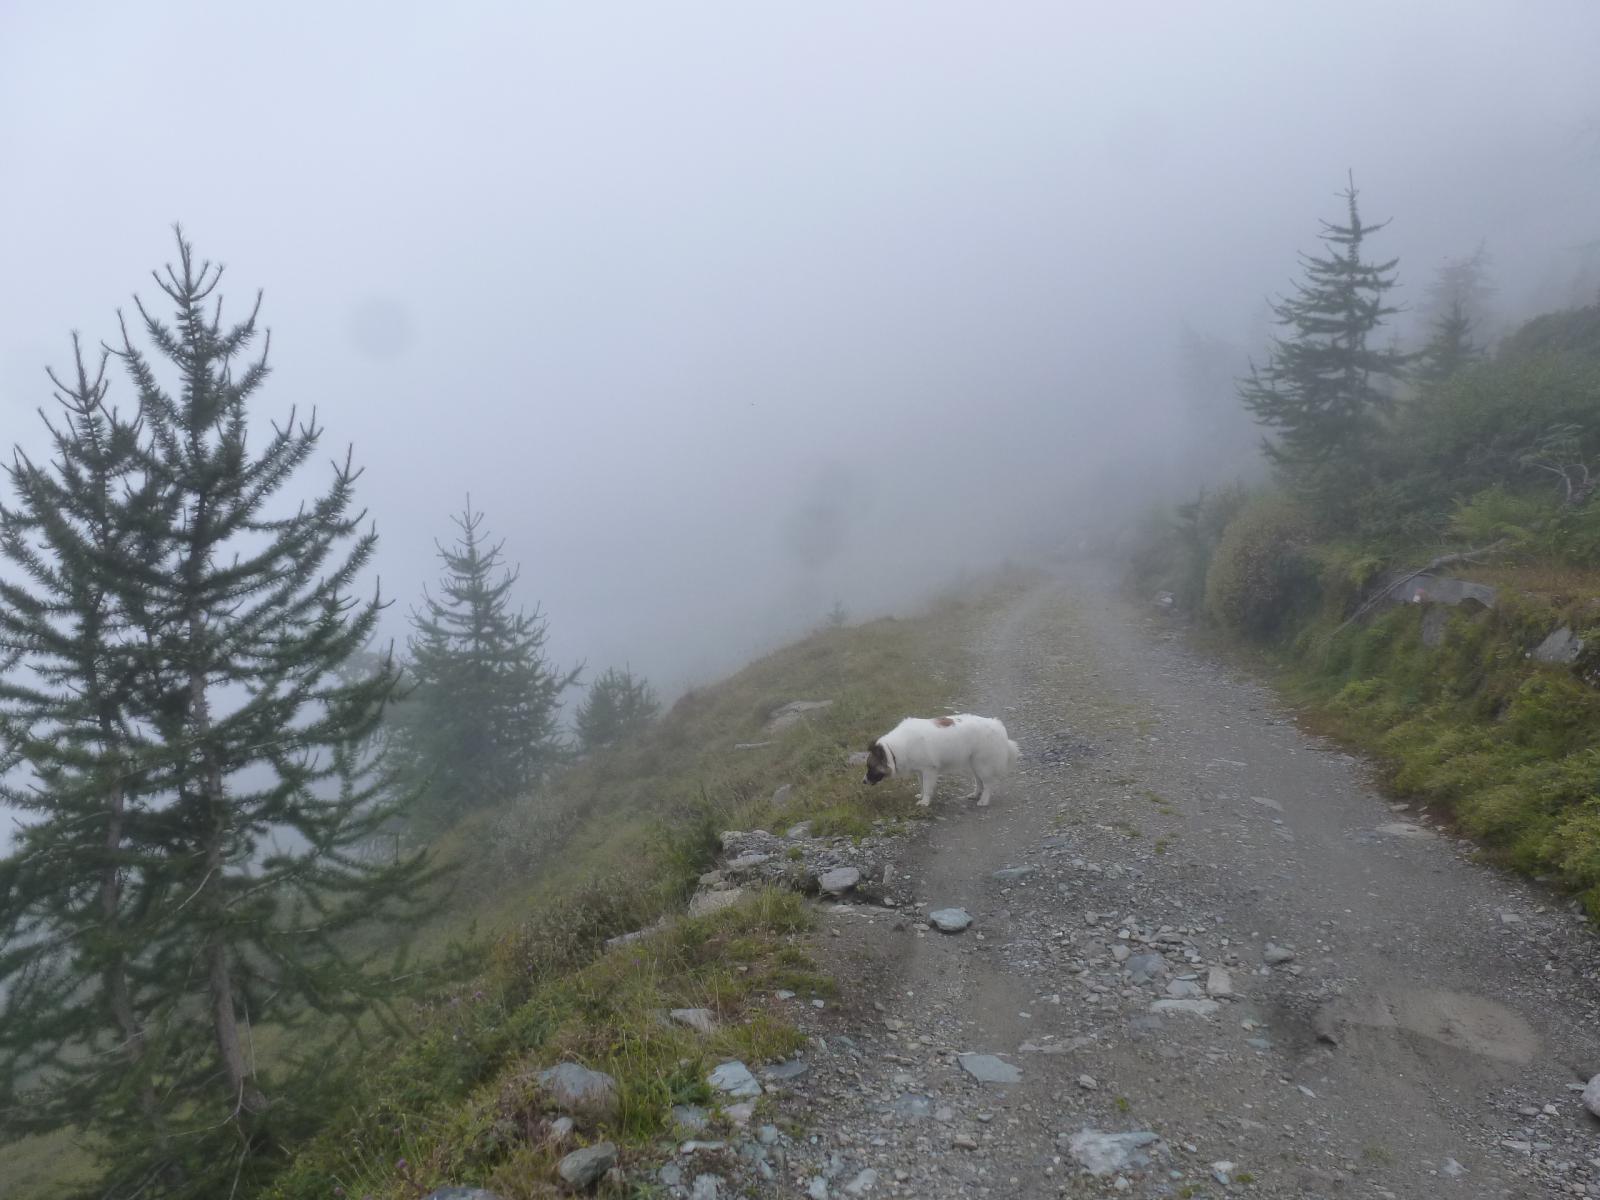 arrivano le nebbie